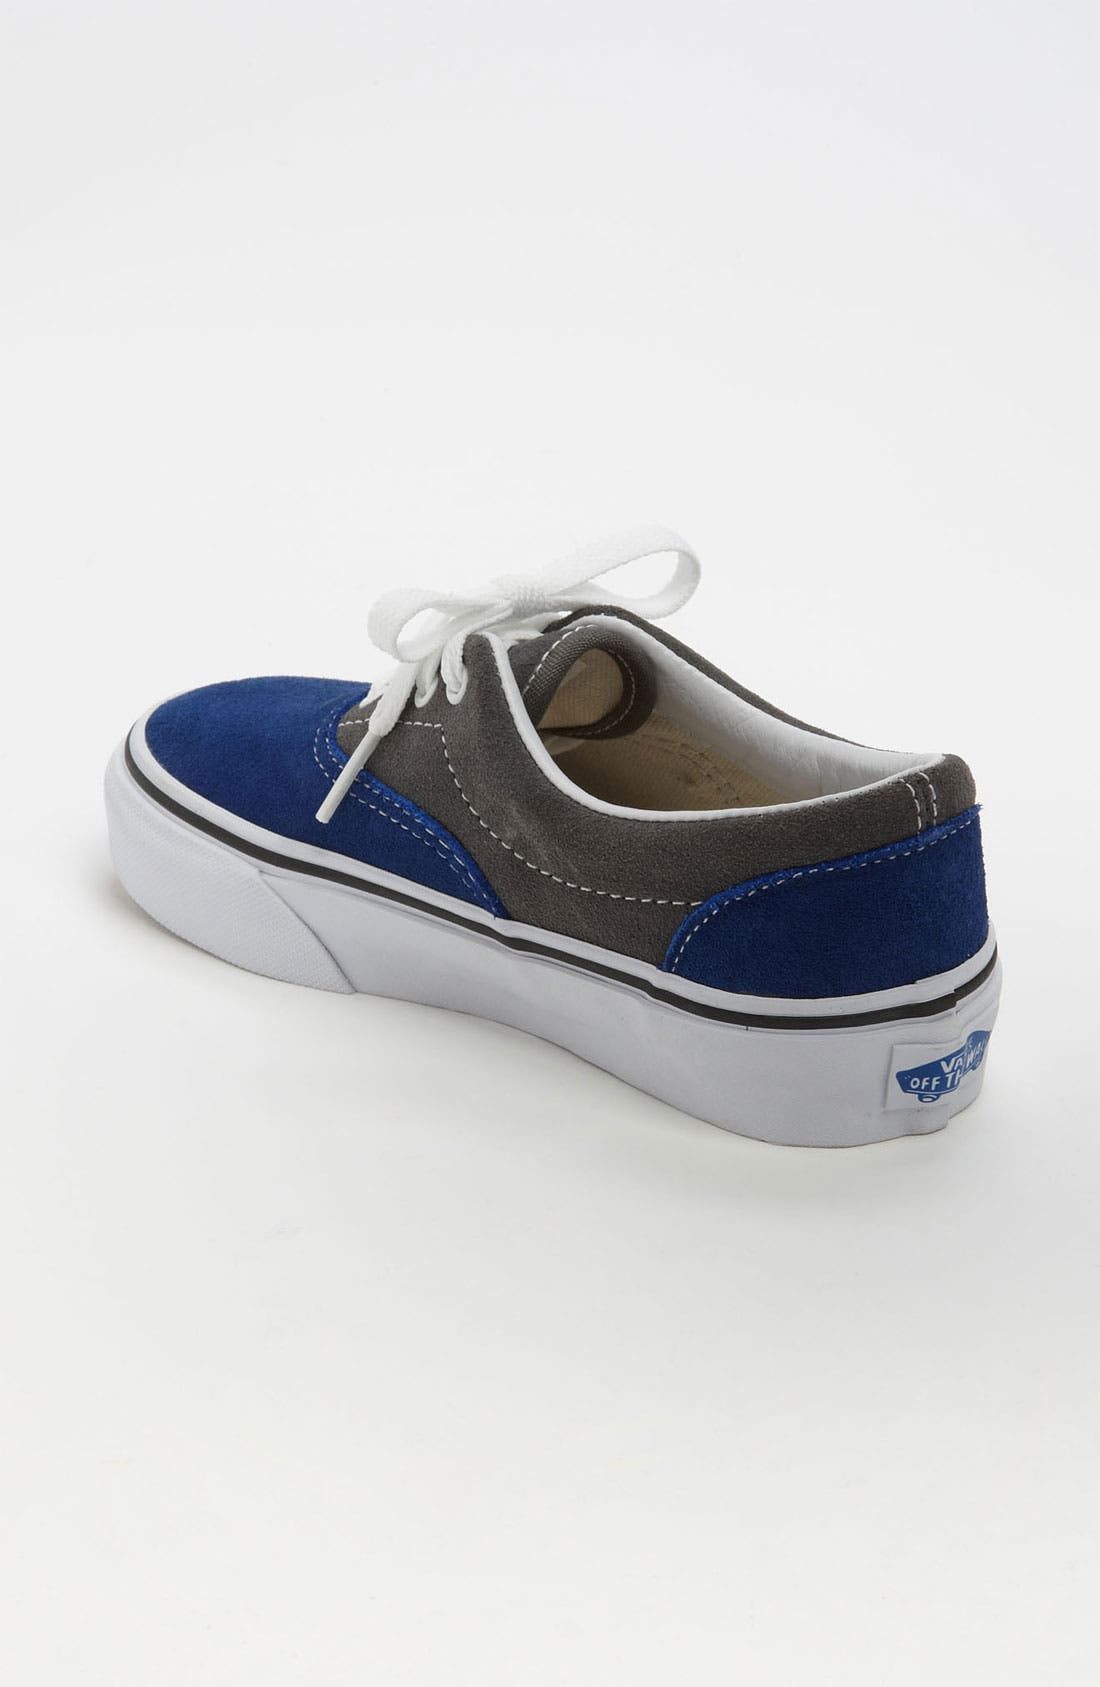 Alternate Image 2  - Vans 'Era' Sneaker (Toddler, Little Kid & Big Kid)